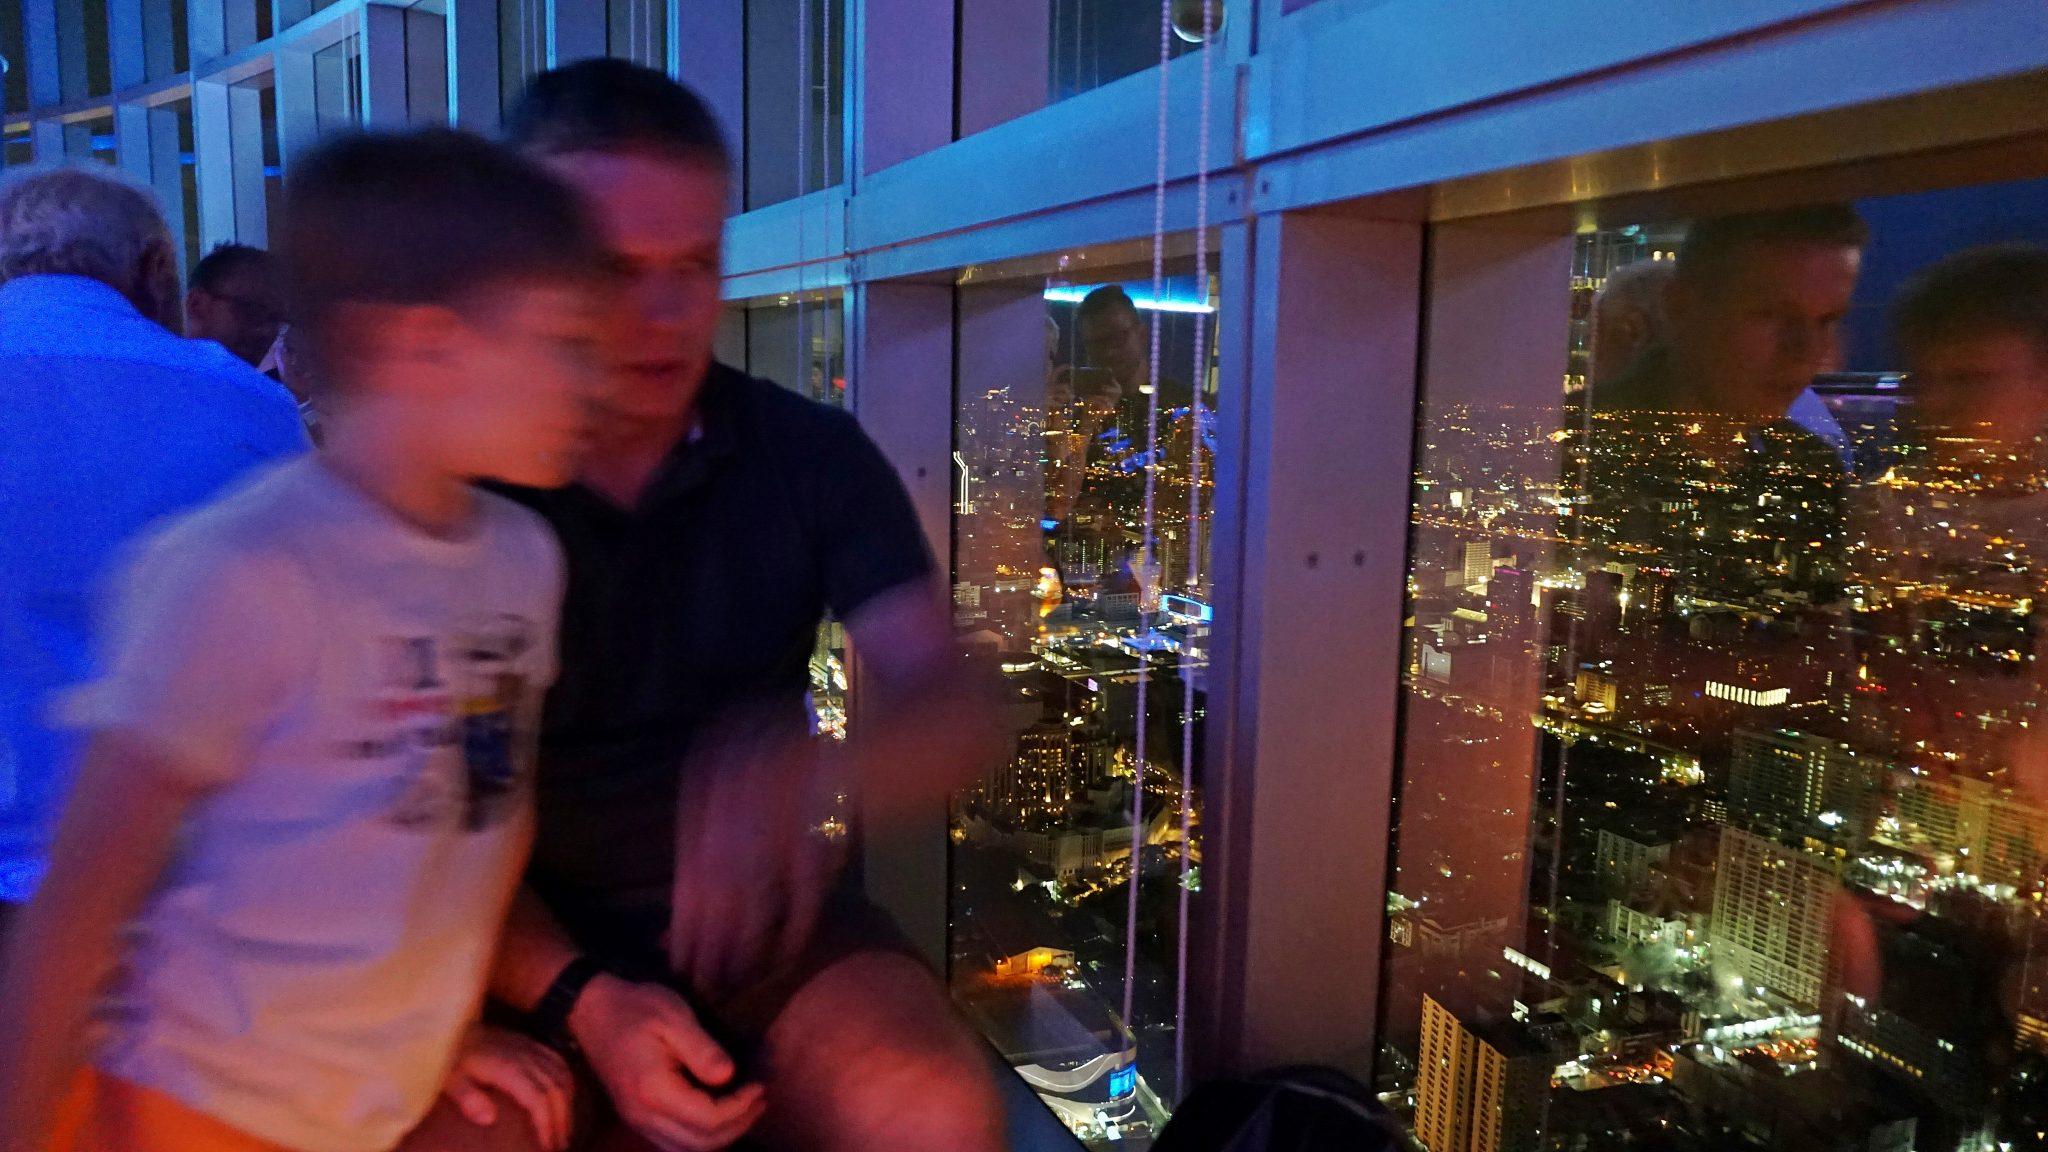 Bangkok atrakcje Baiyoke Hotel Sky Bar panorama, dziecko, HAART.pl blog diy zrób to sam